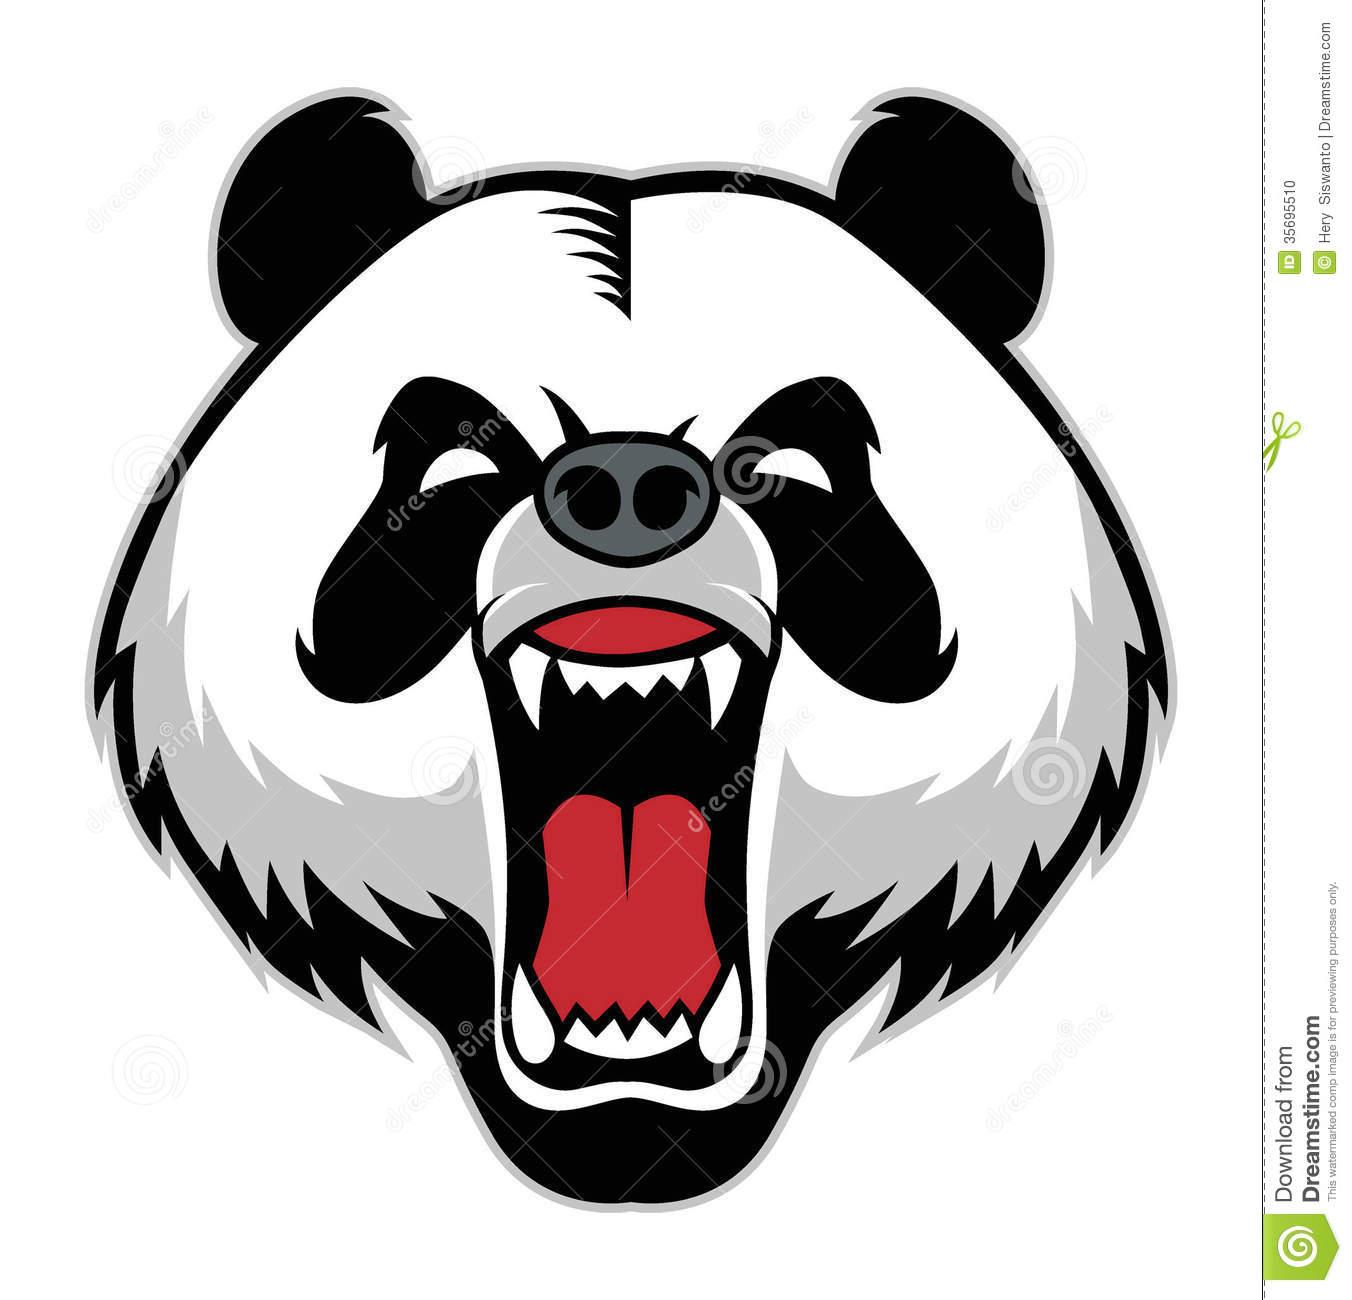 1352x1300 Panda Clipart Angry